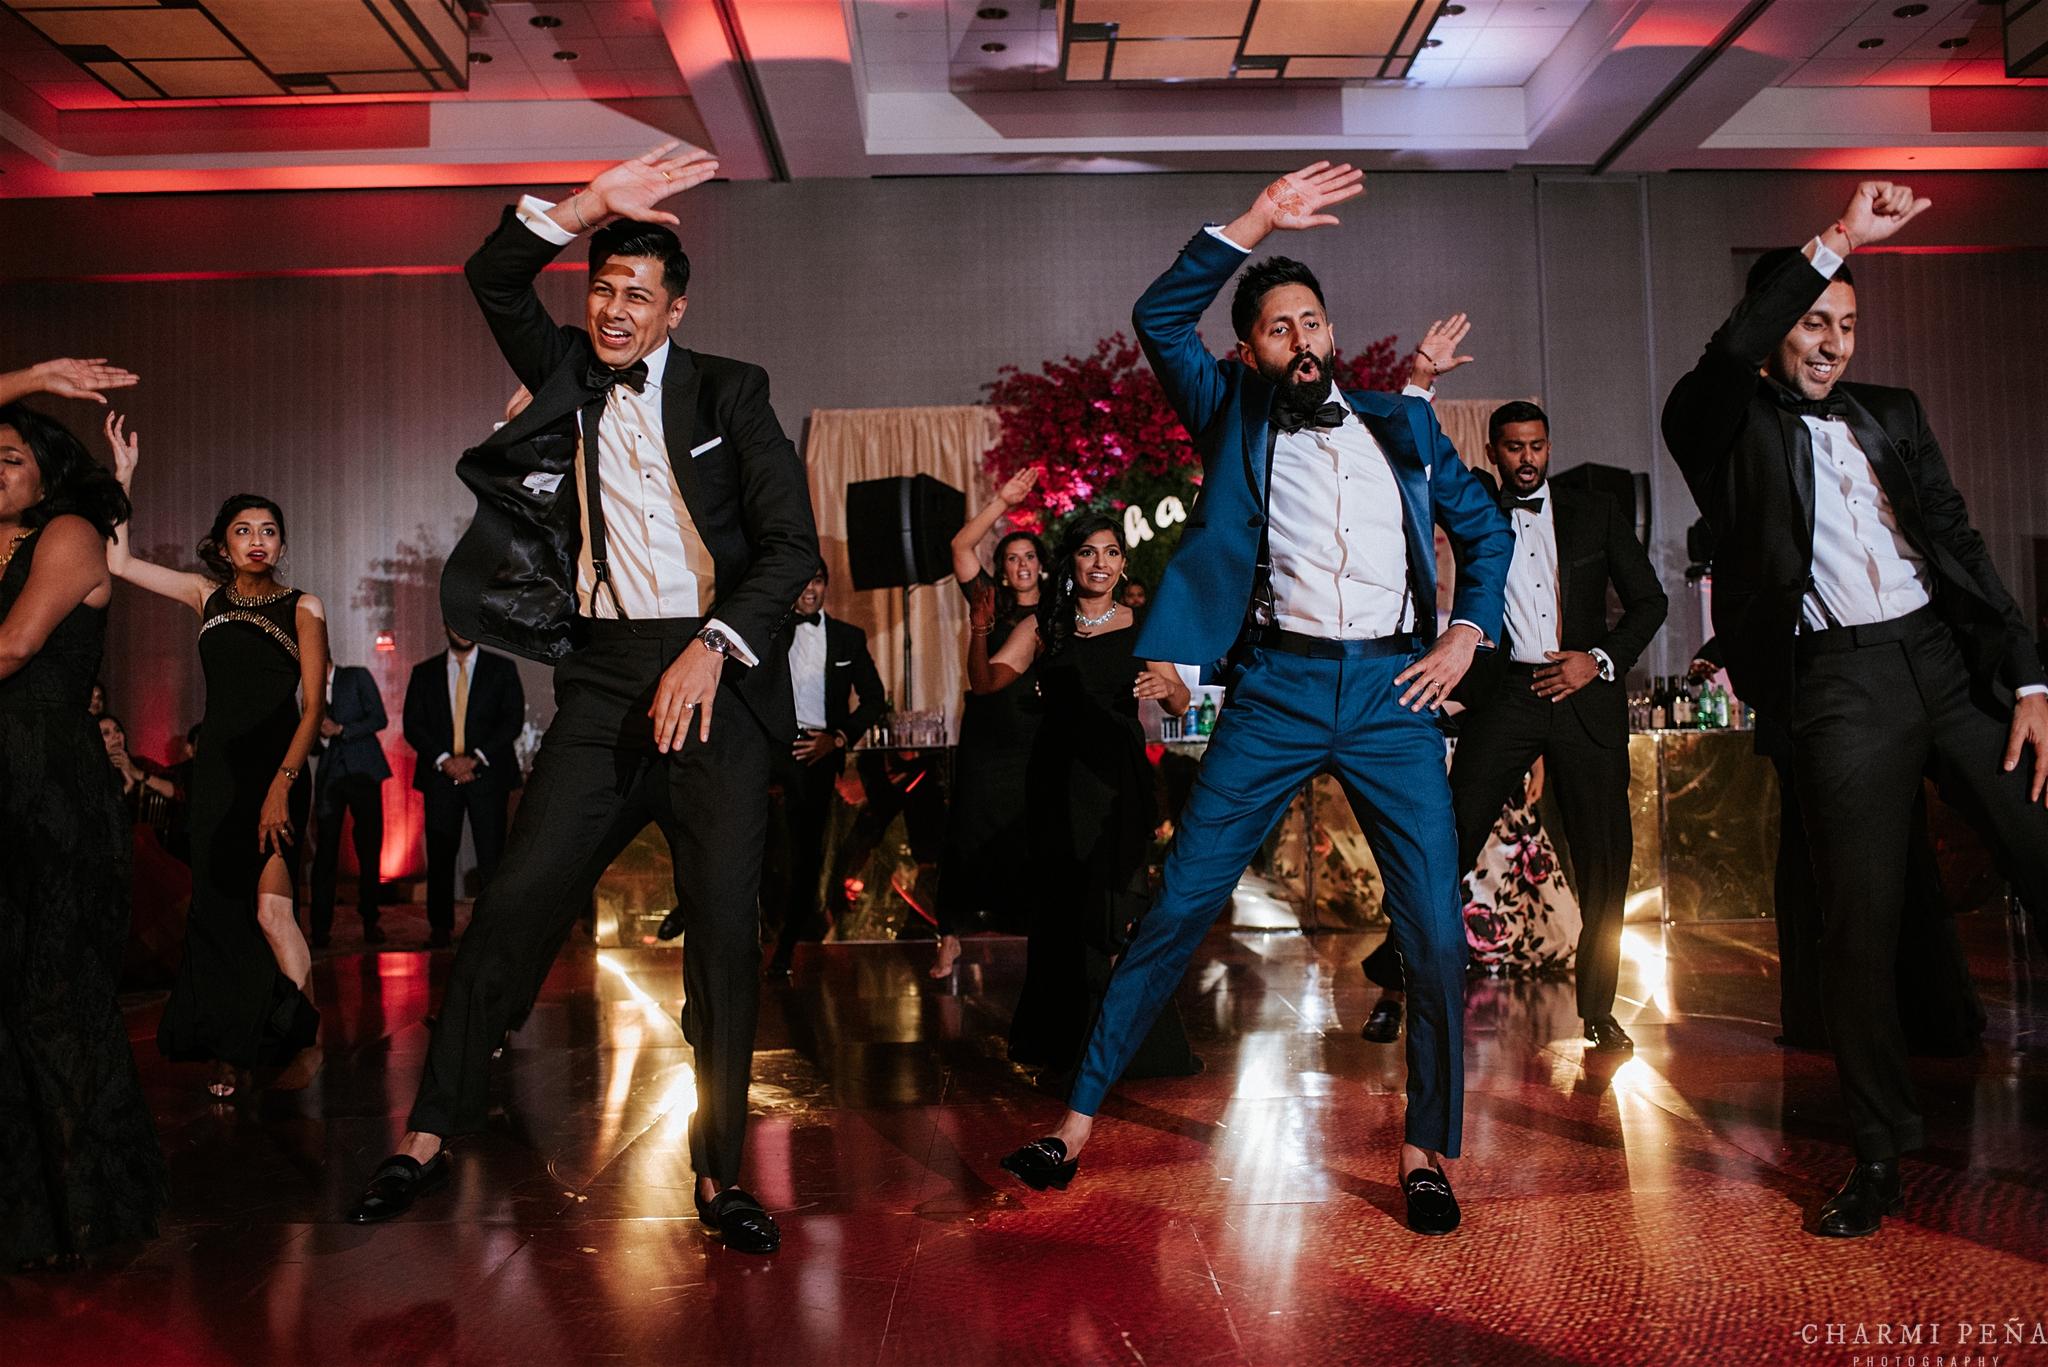 INDIAN WEDDING RECEPTION GROOM DANCING.jpg